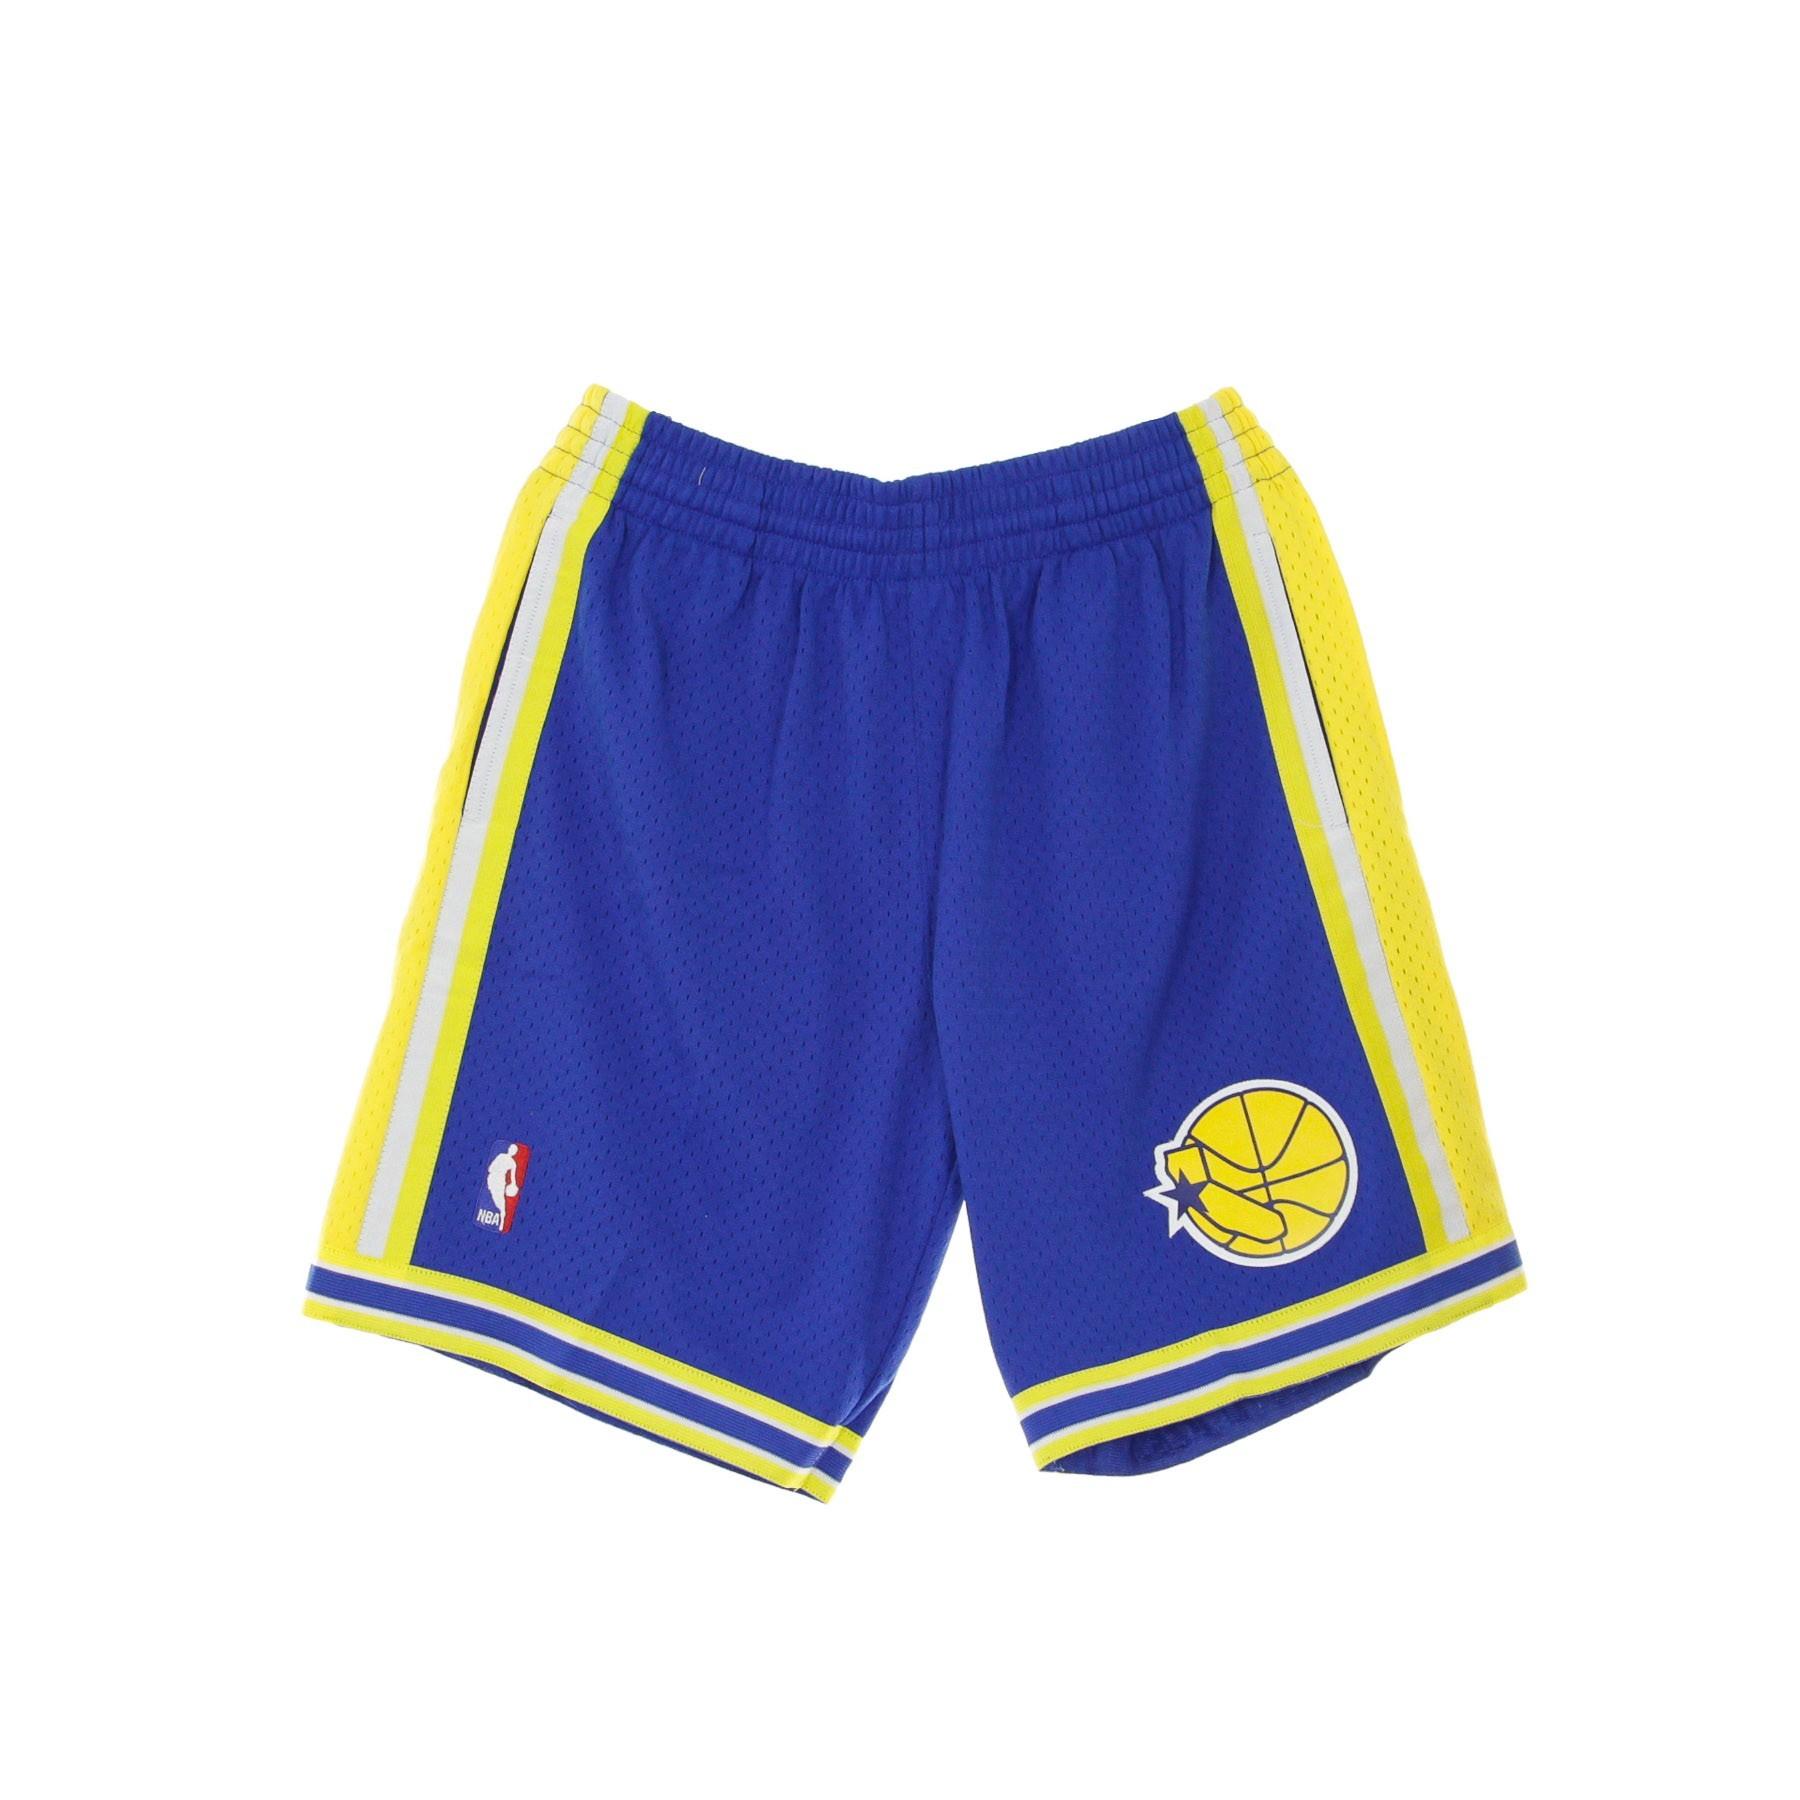 PANTALONE CORTO NBA SWINGMAN SHORTS 1995-96 GOLWAR ROAD 42.5